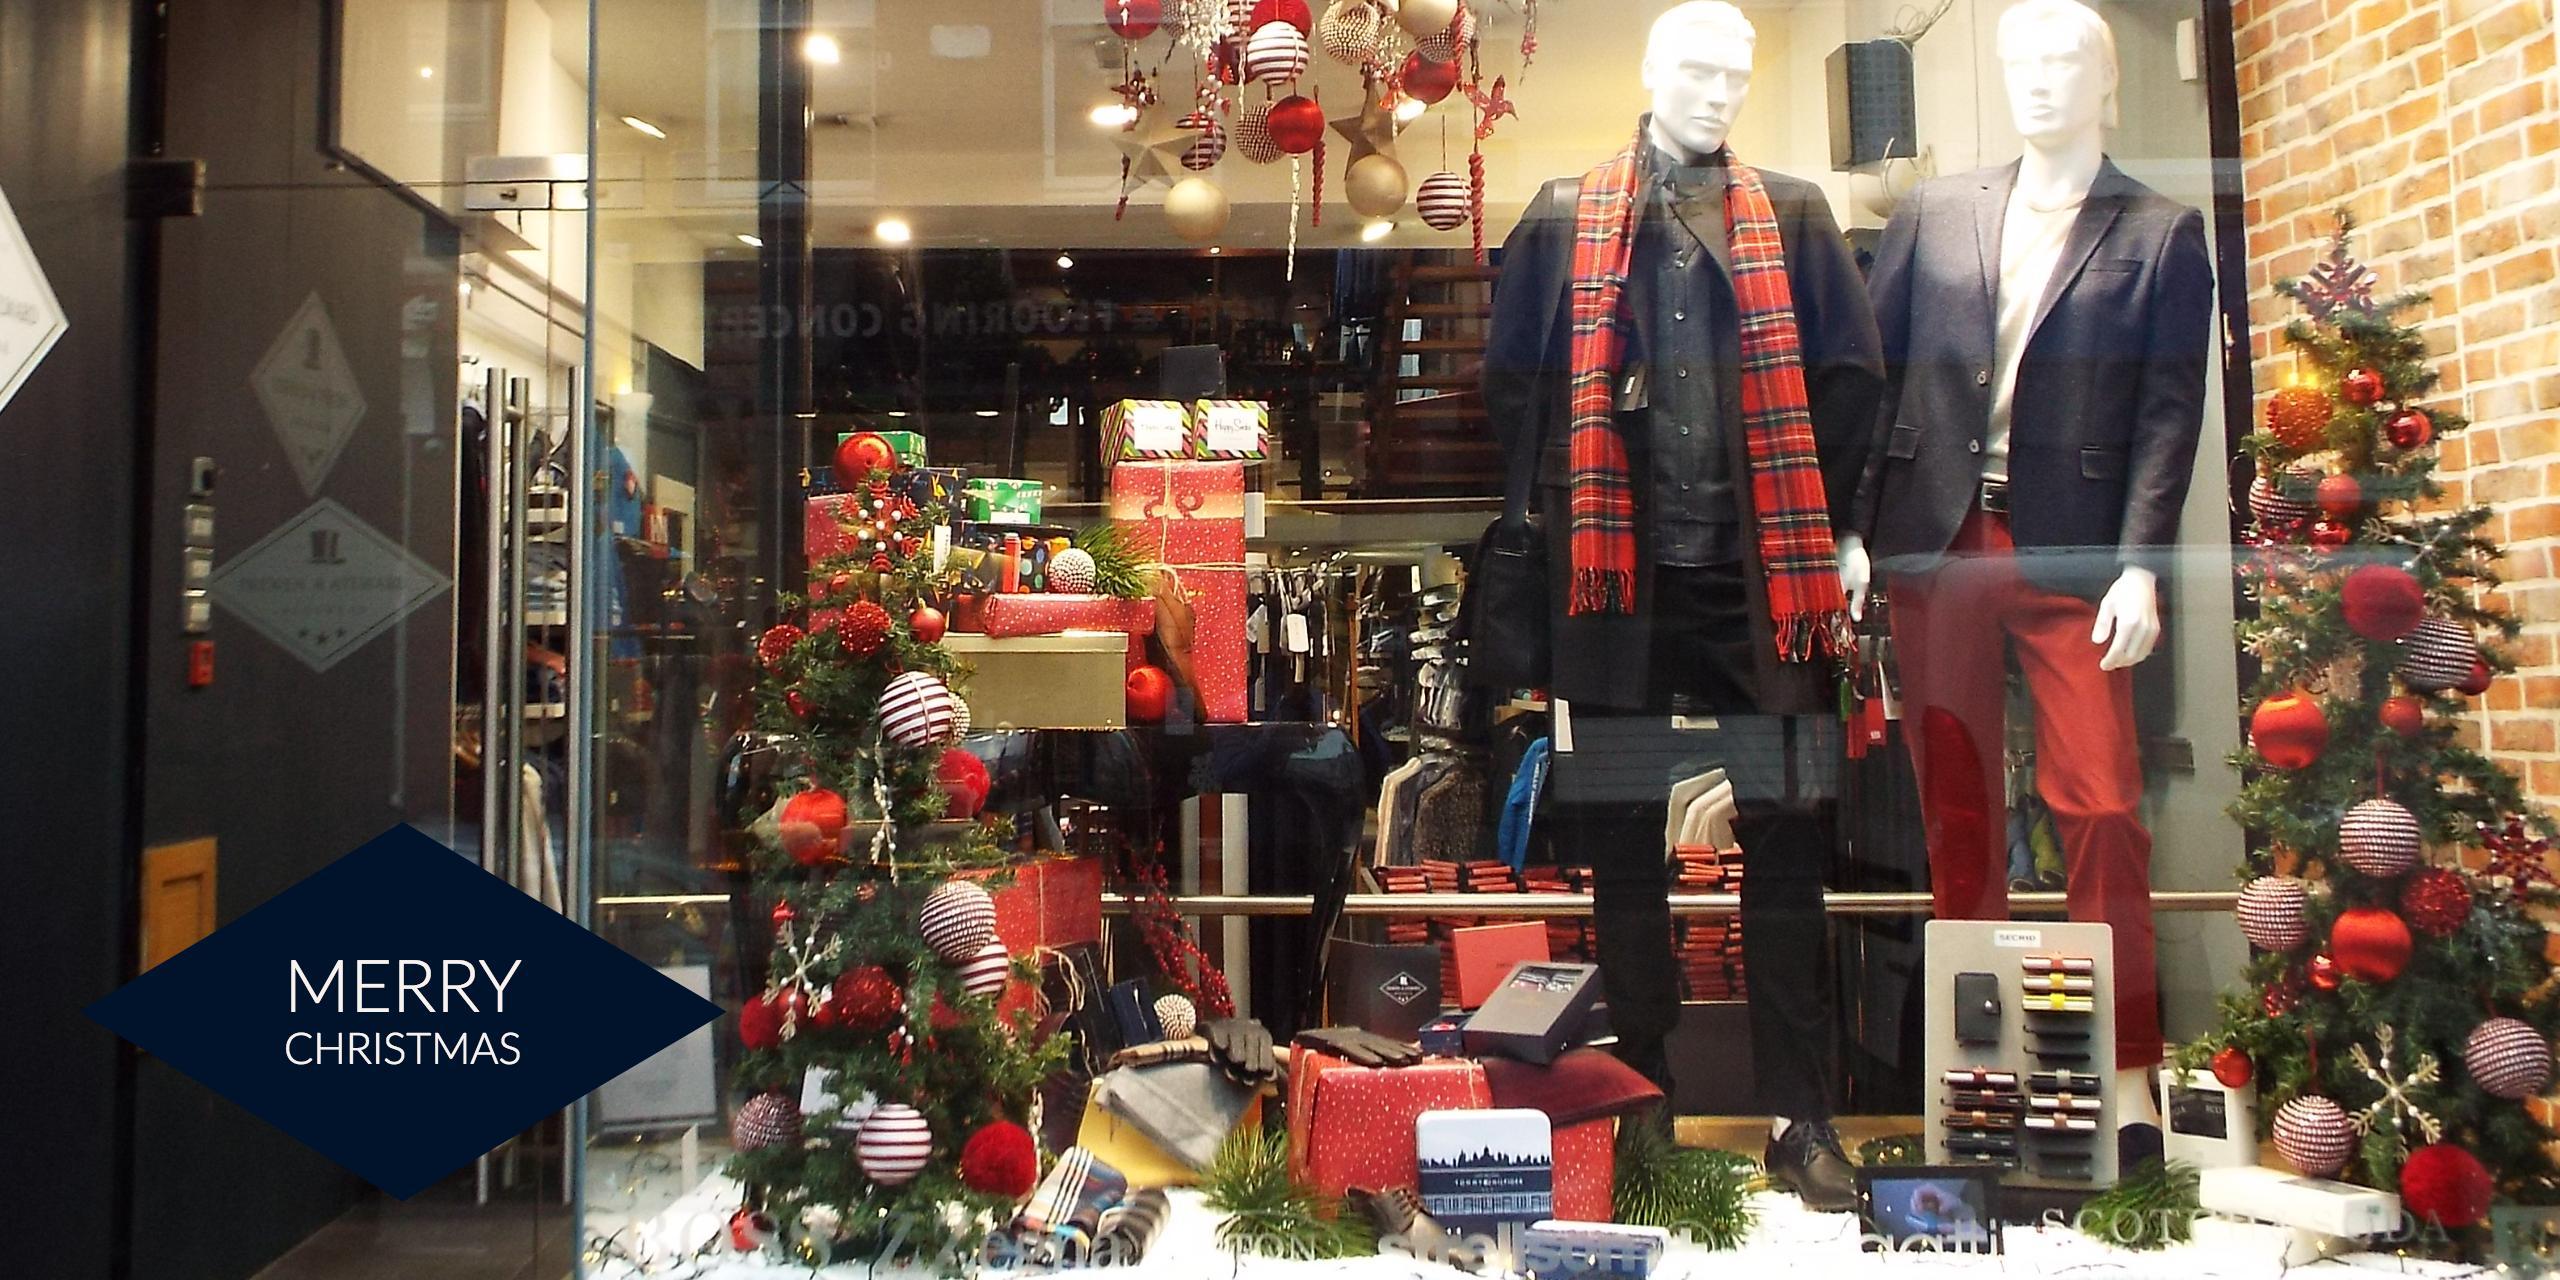 designer menswear christmas gifts for men frewen and aylward